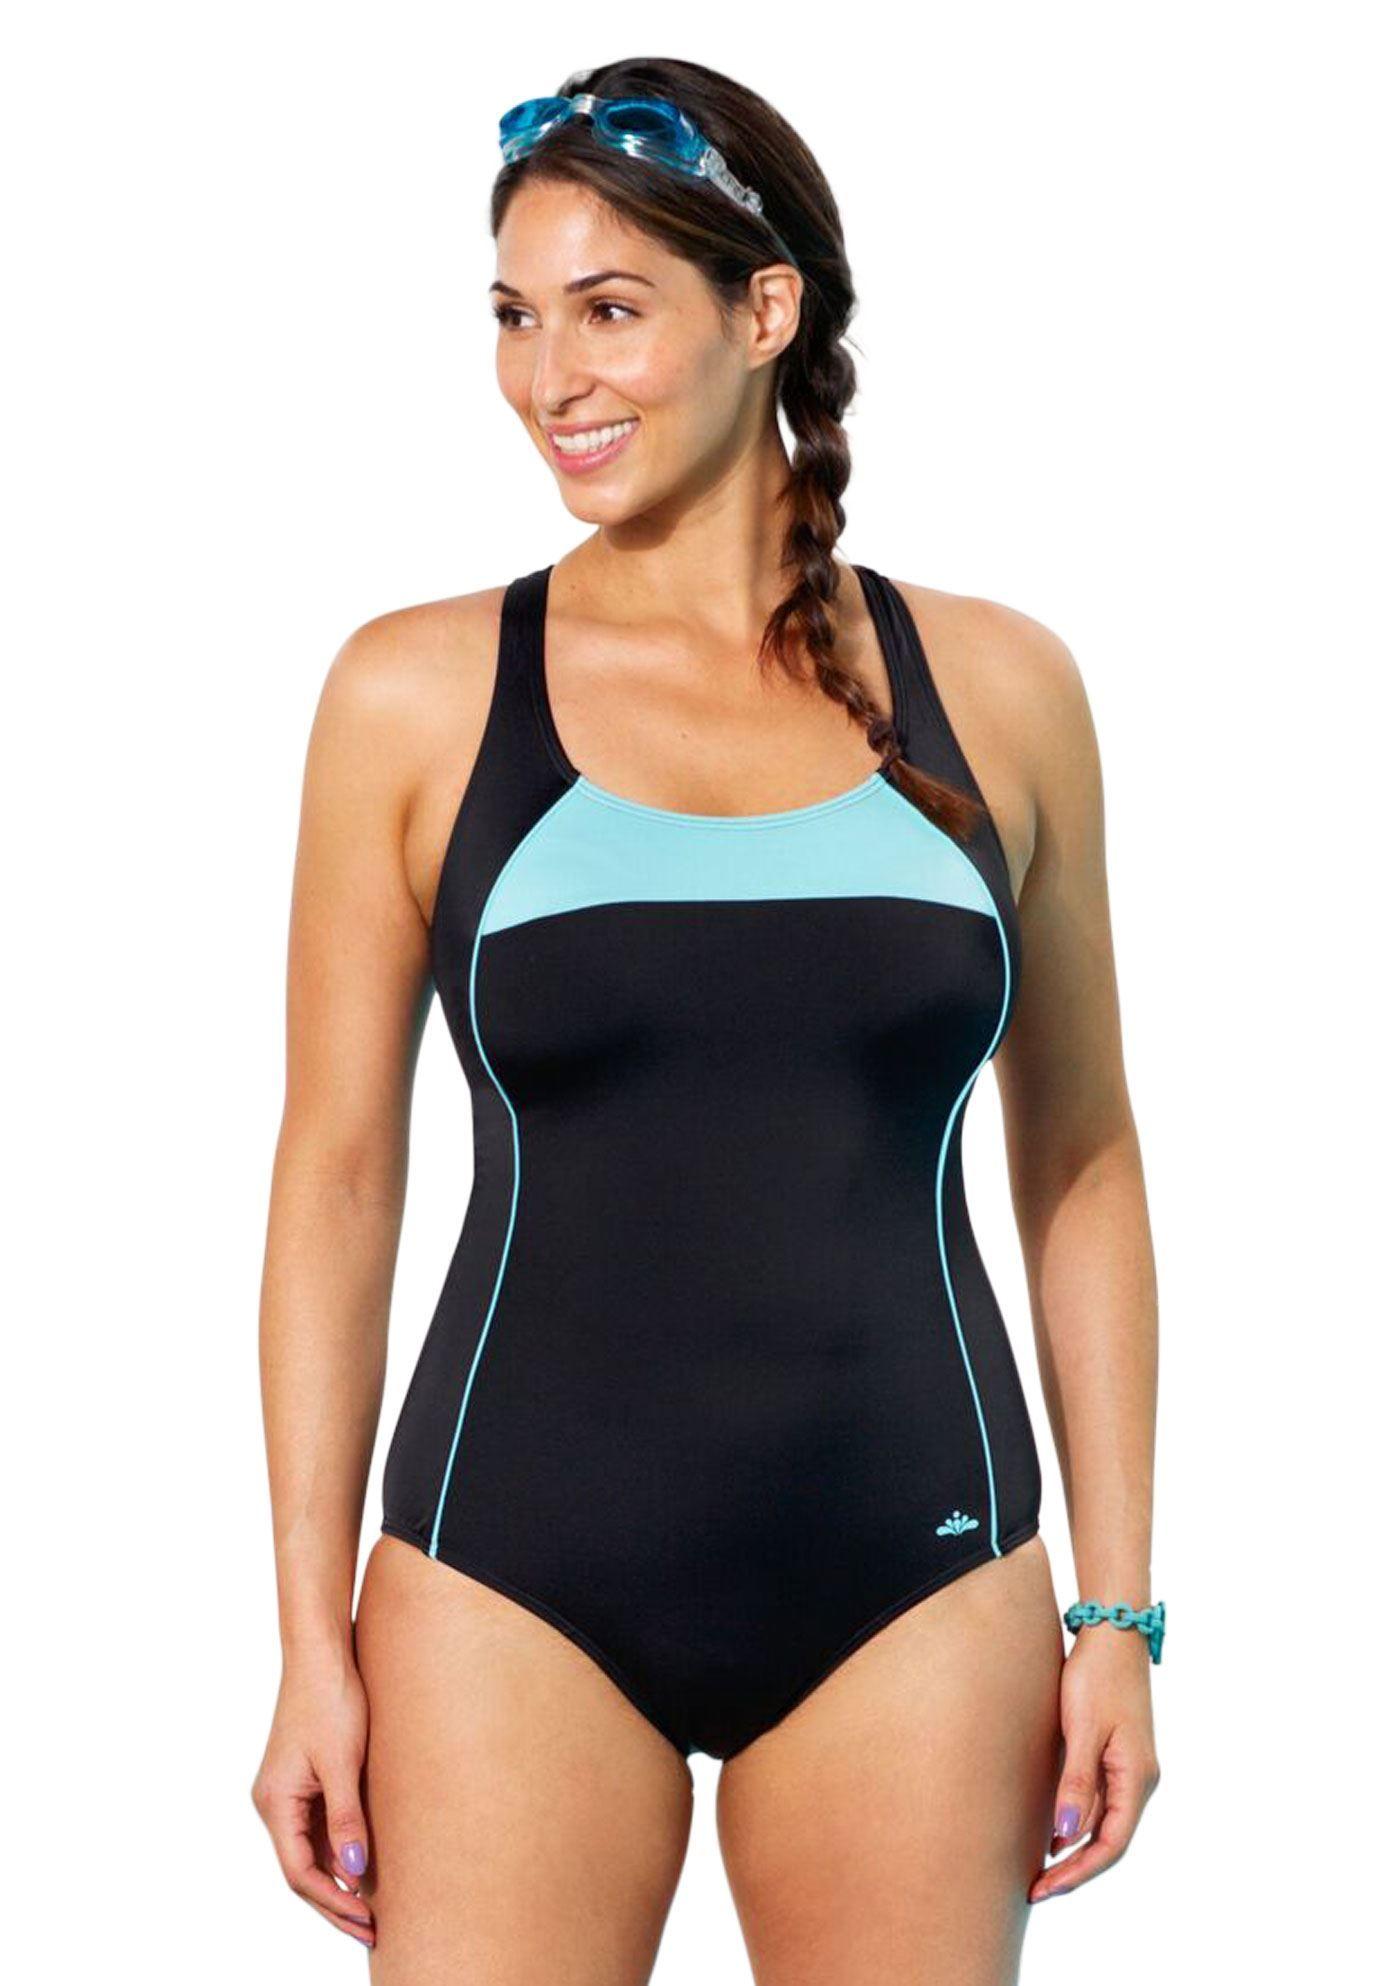 b30b9e712c Cross Back Maillot by Aquabelle - Women s Plus Size Clothing ...